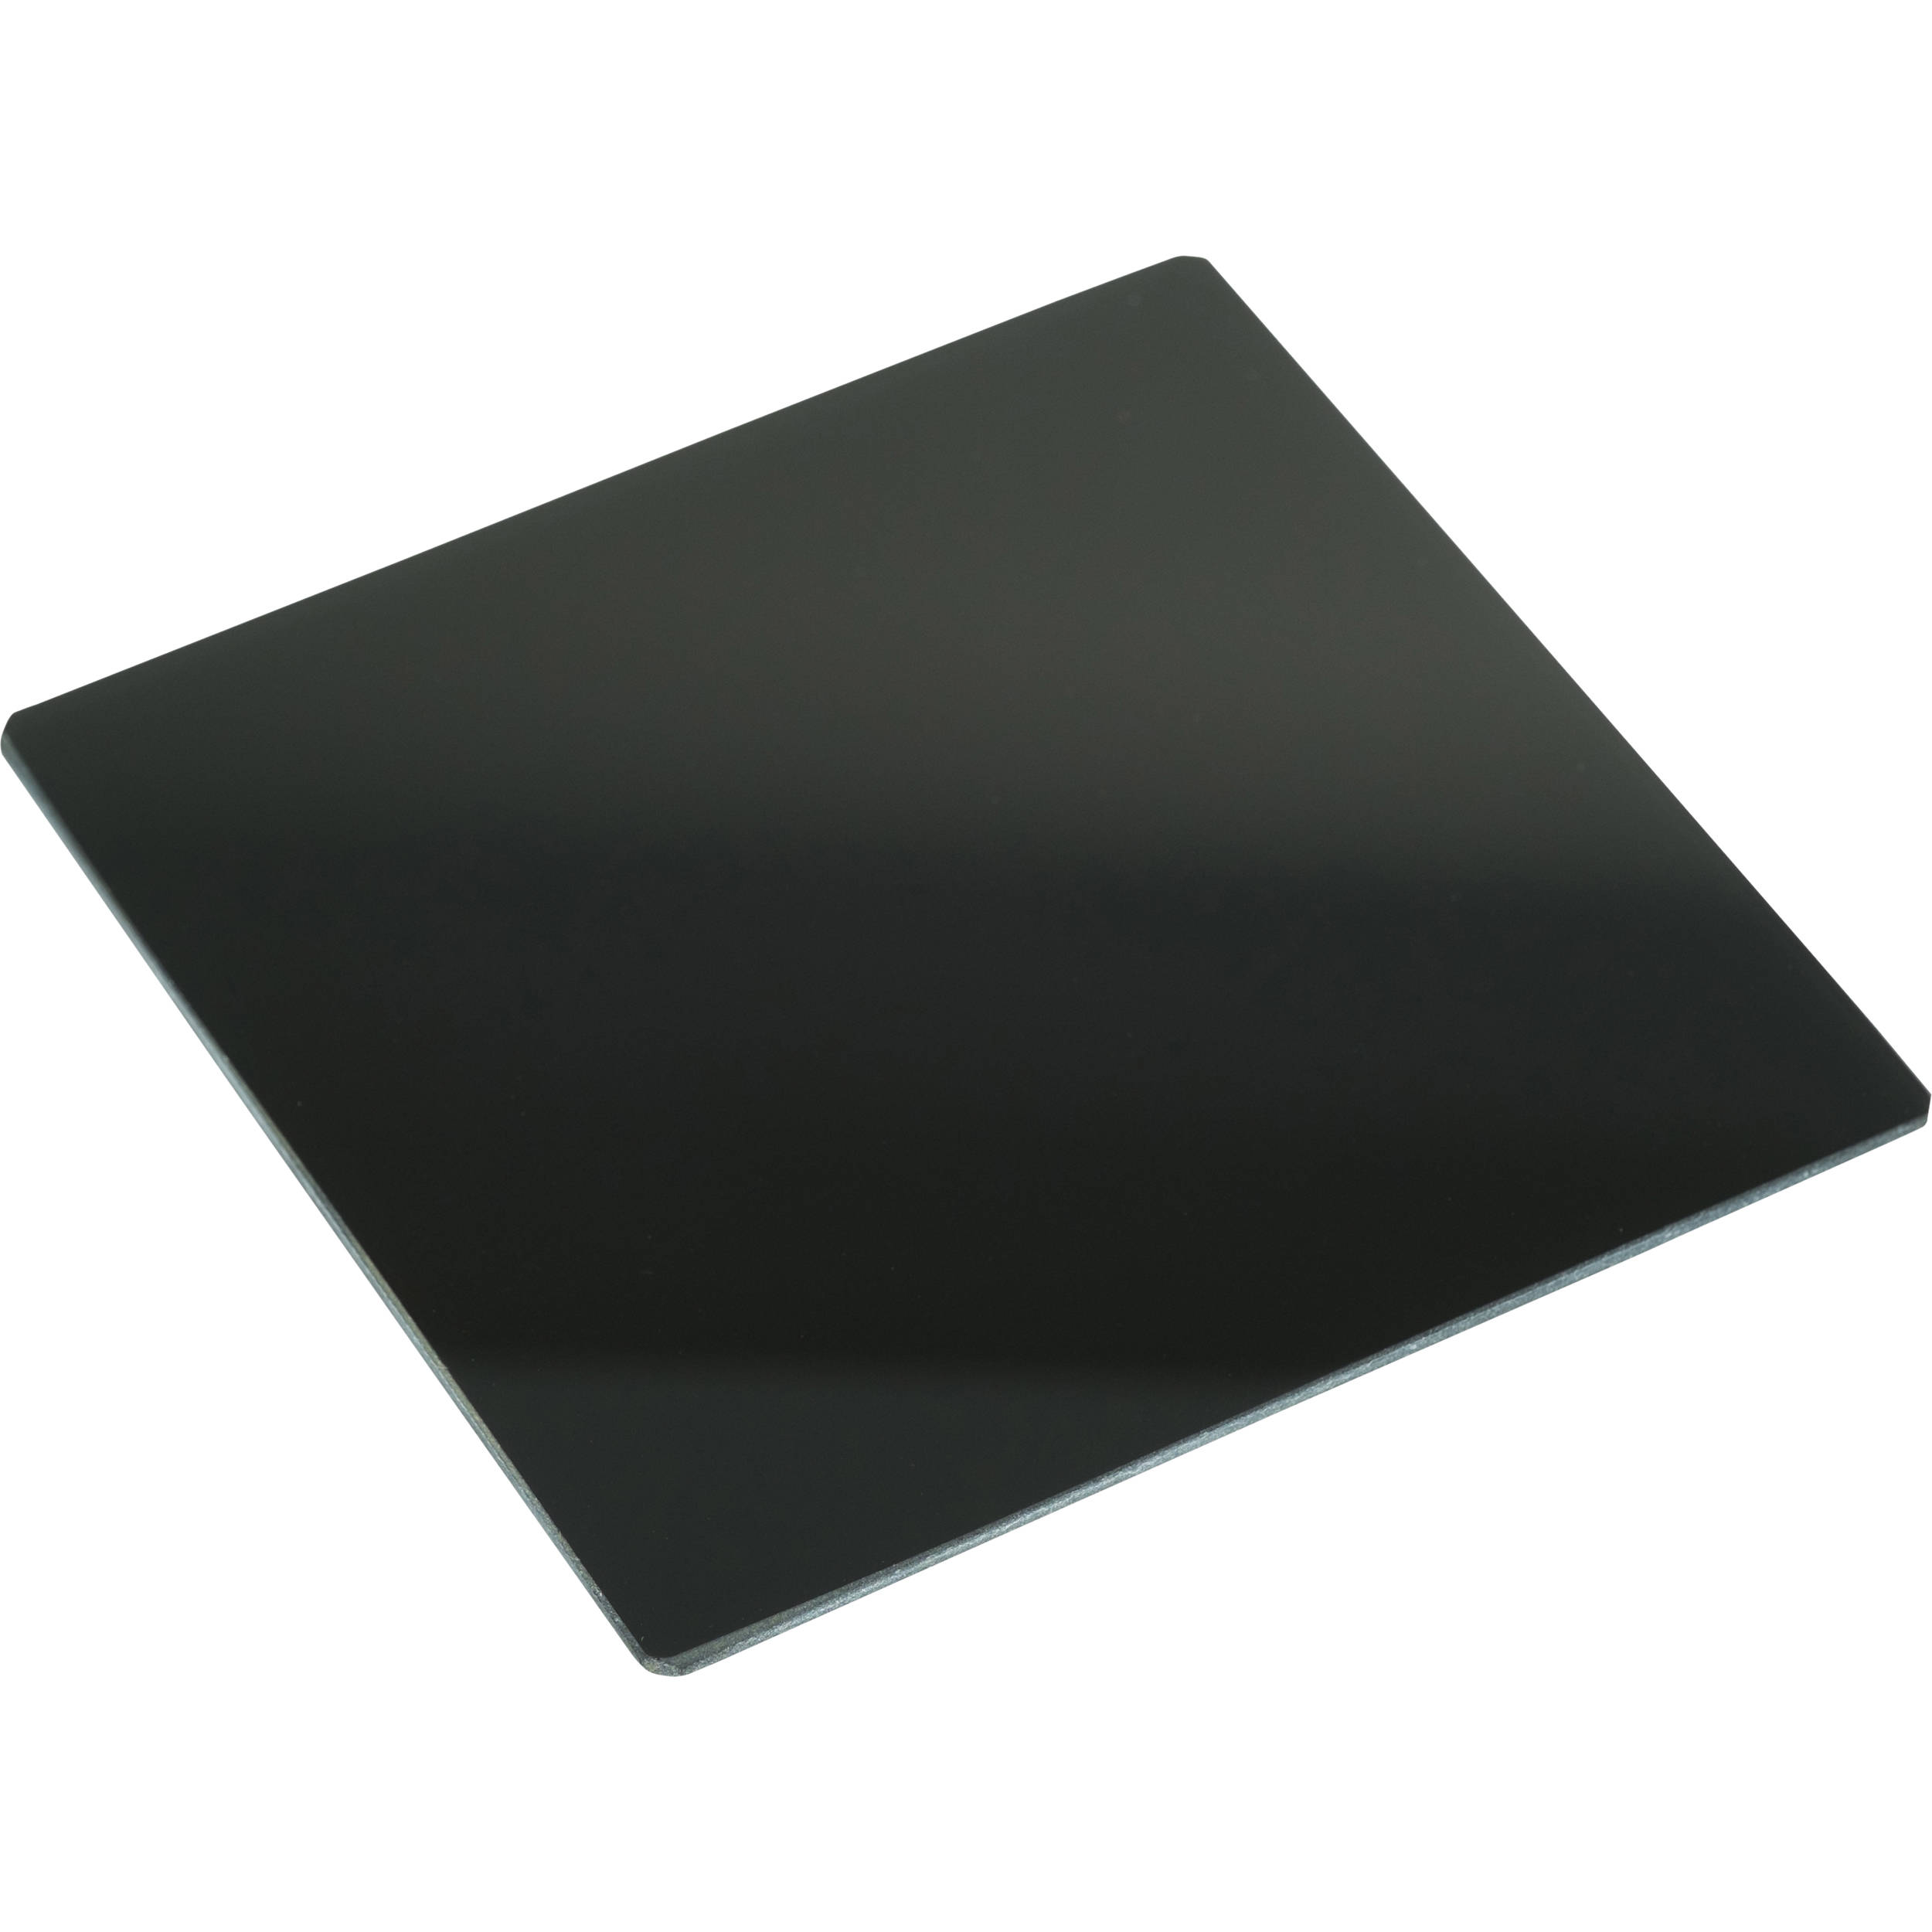 Lee Filters 100 X 100mm Little Stopper 1 8 Neutral Density